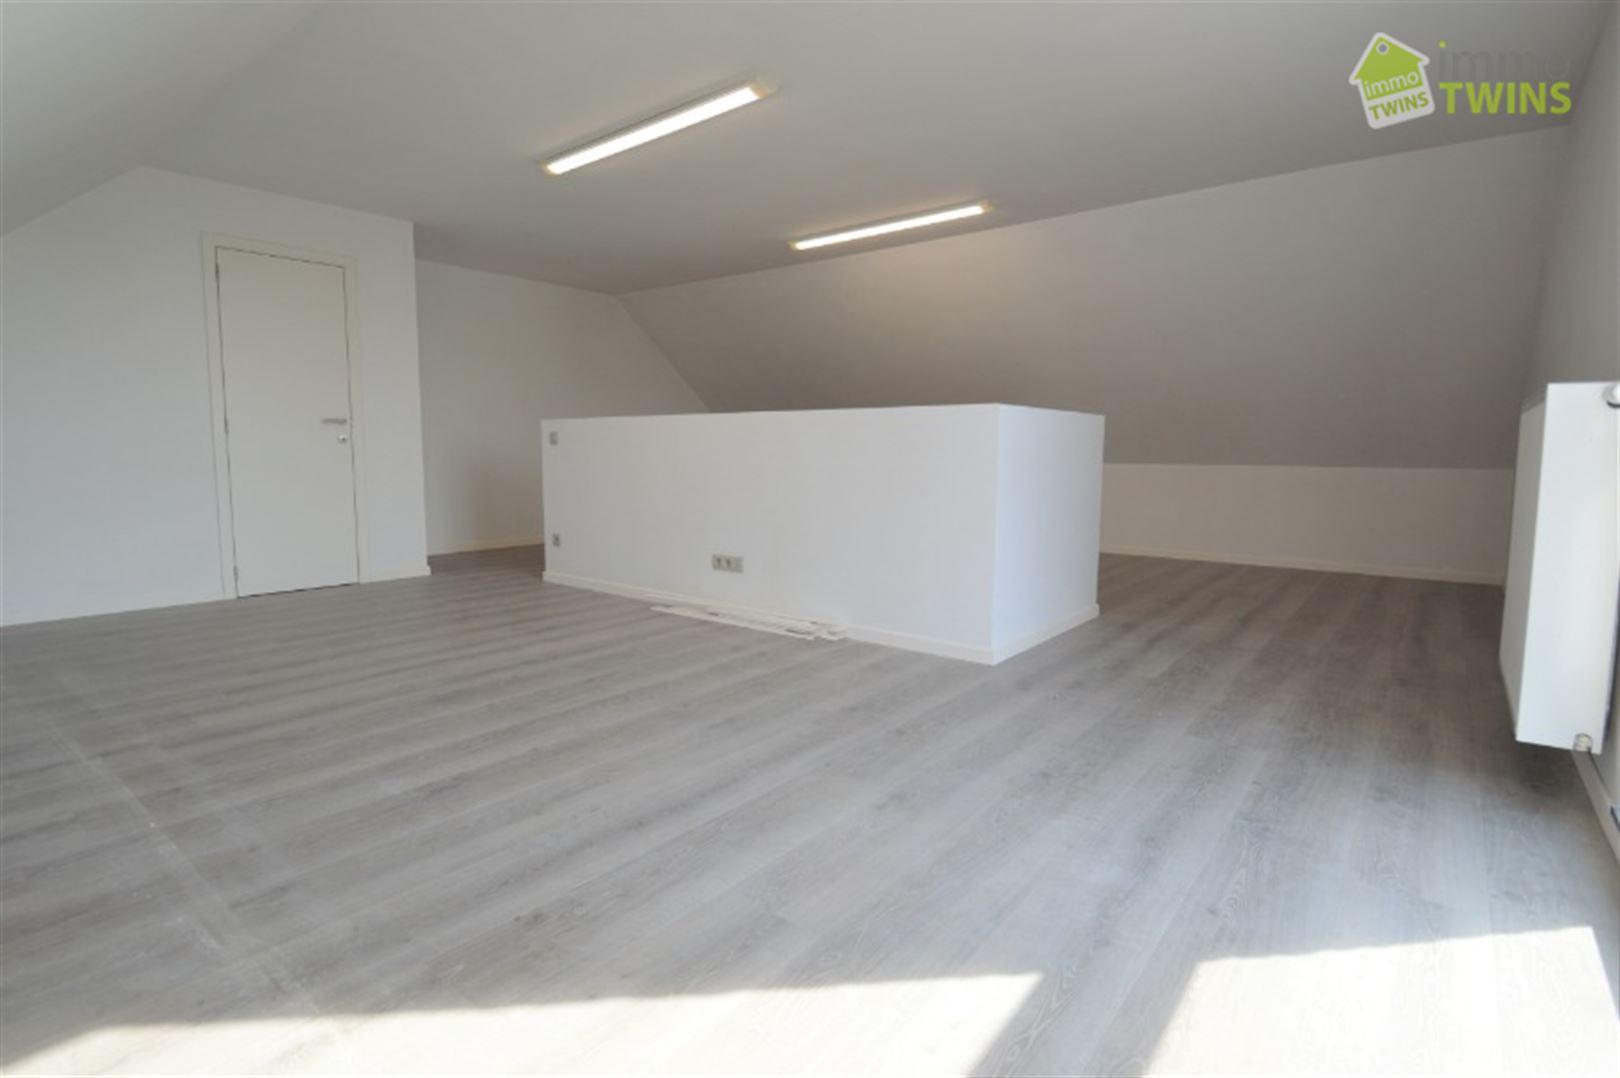 Foto 21 : Woning te 9200 Sint-Gillis-bij-Dendermonde (België) - Prijs € 999